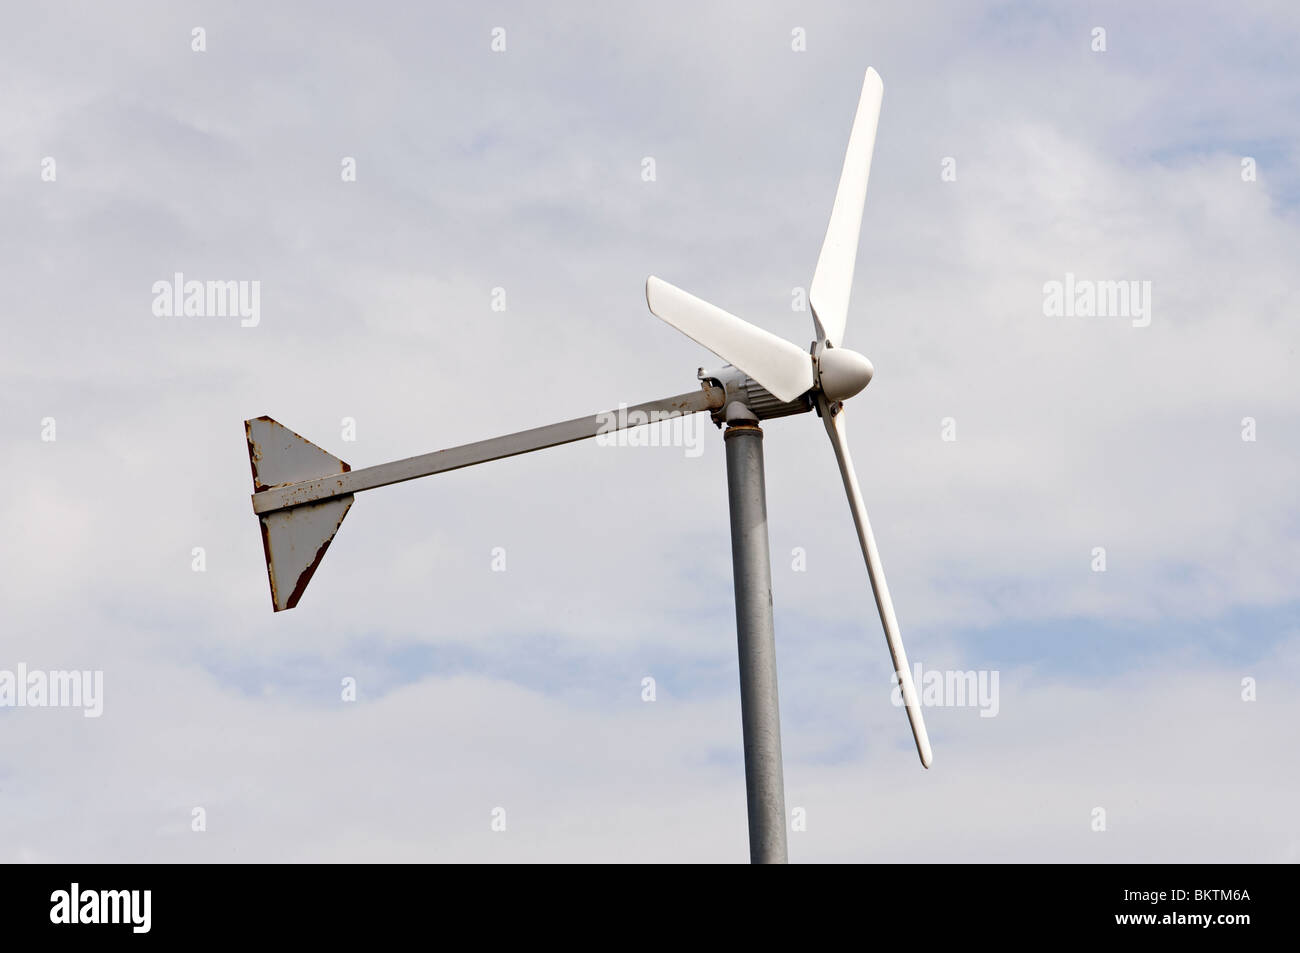 Domestic micro-wind turbine - Stock Image